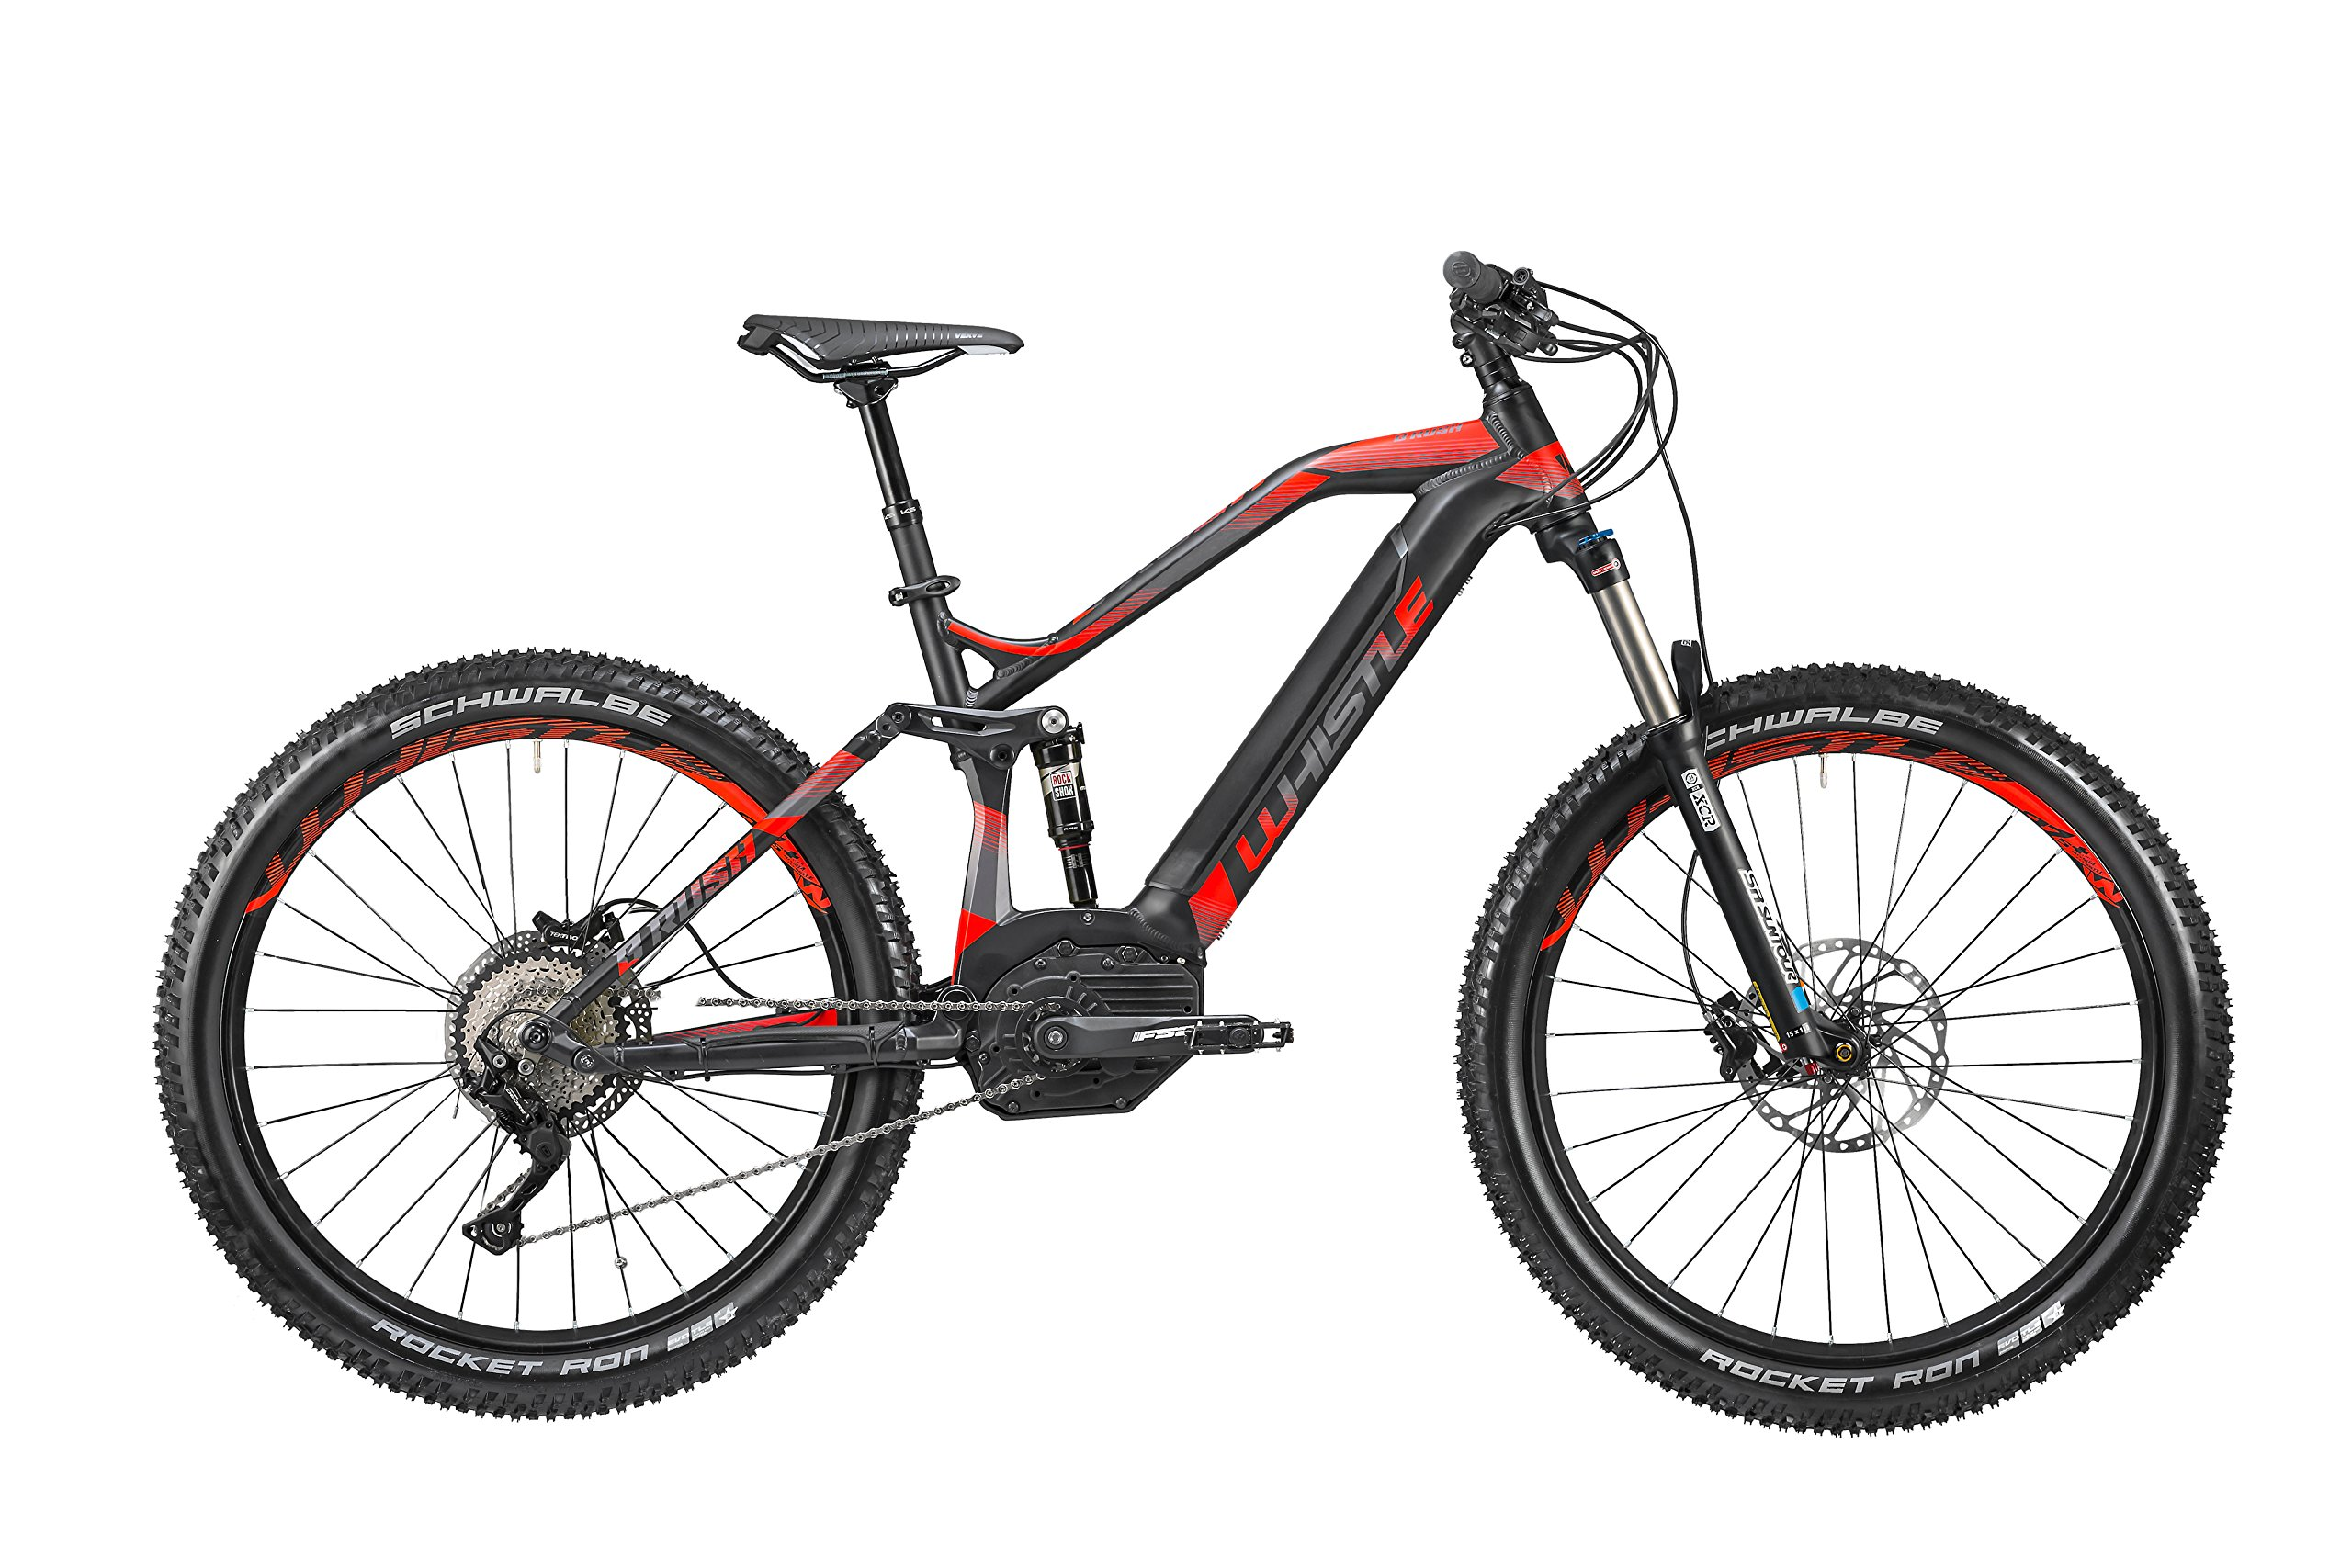 Mountain Bike eléctrica bi-ammortizzata Whistle b-rush Plus S Ltd ...